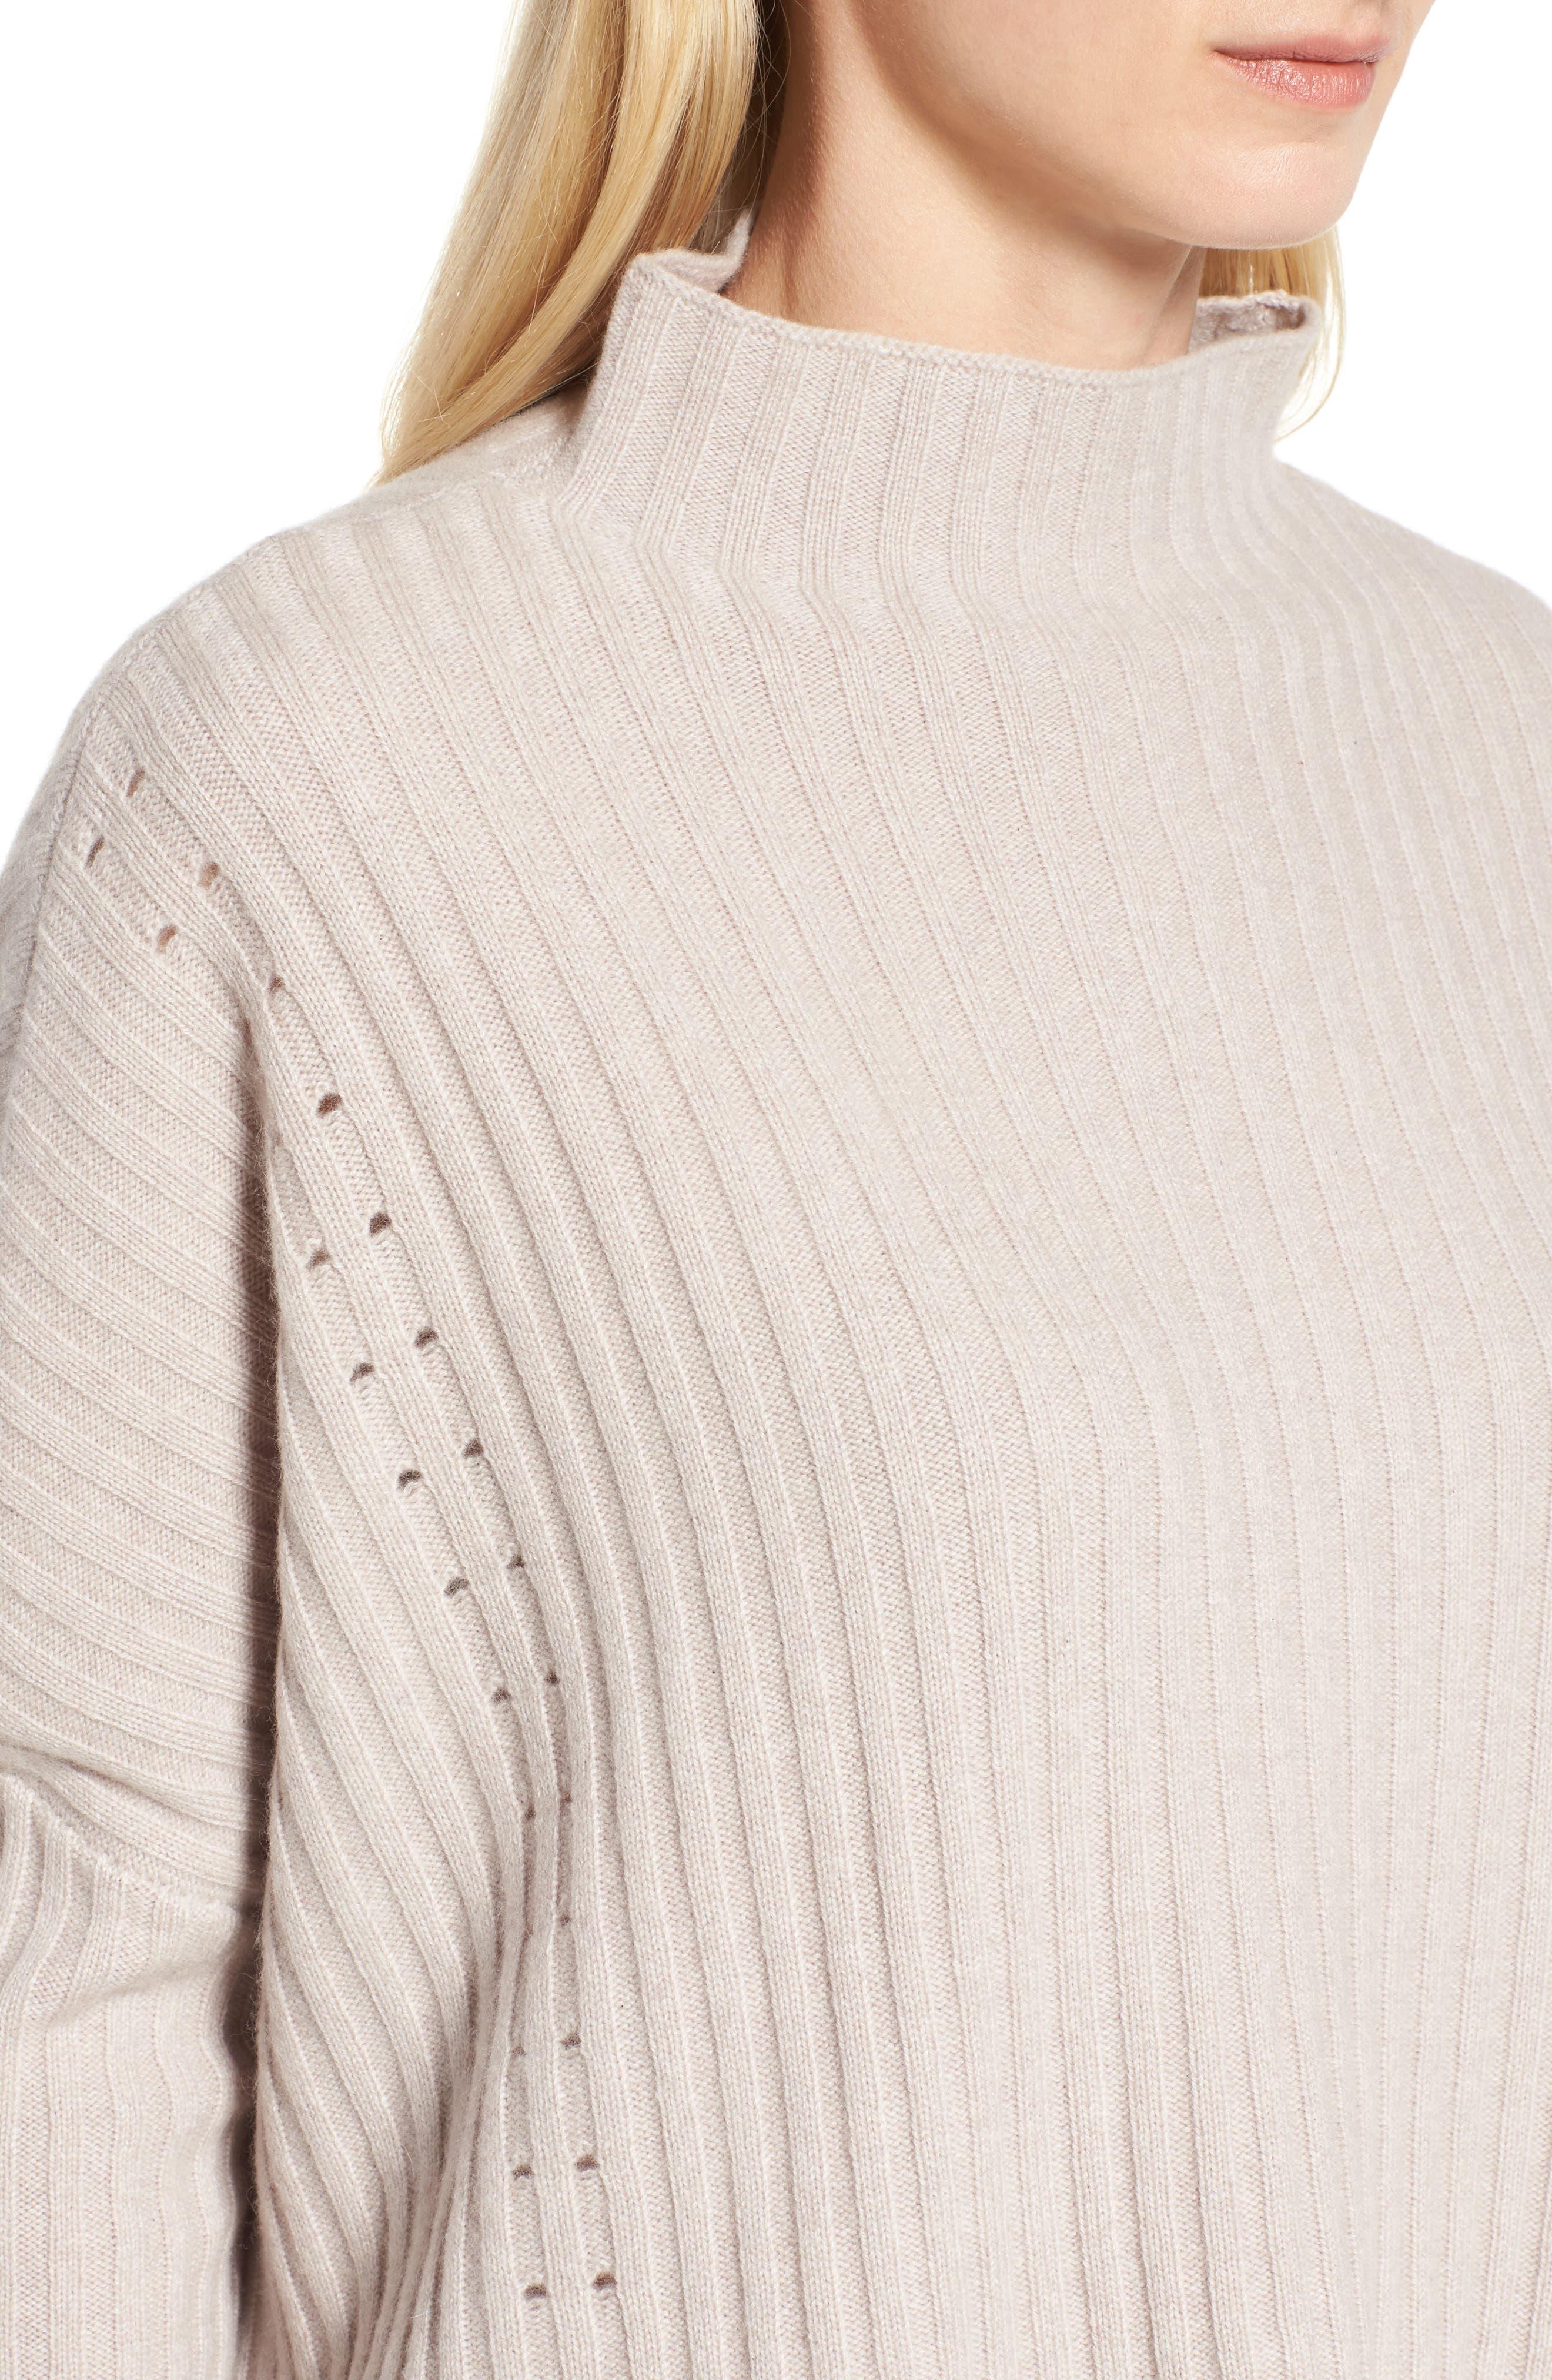 Alternate Image 4  - Nordstrom Signature Boxy Ribbed Cashmere Sweater